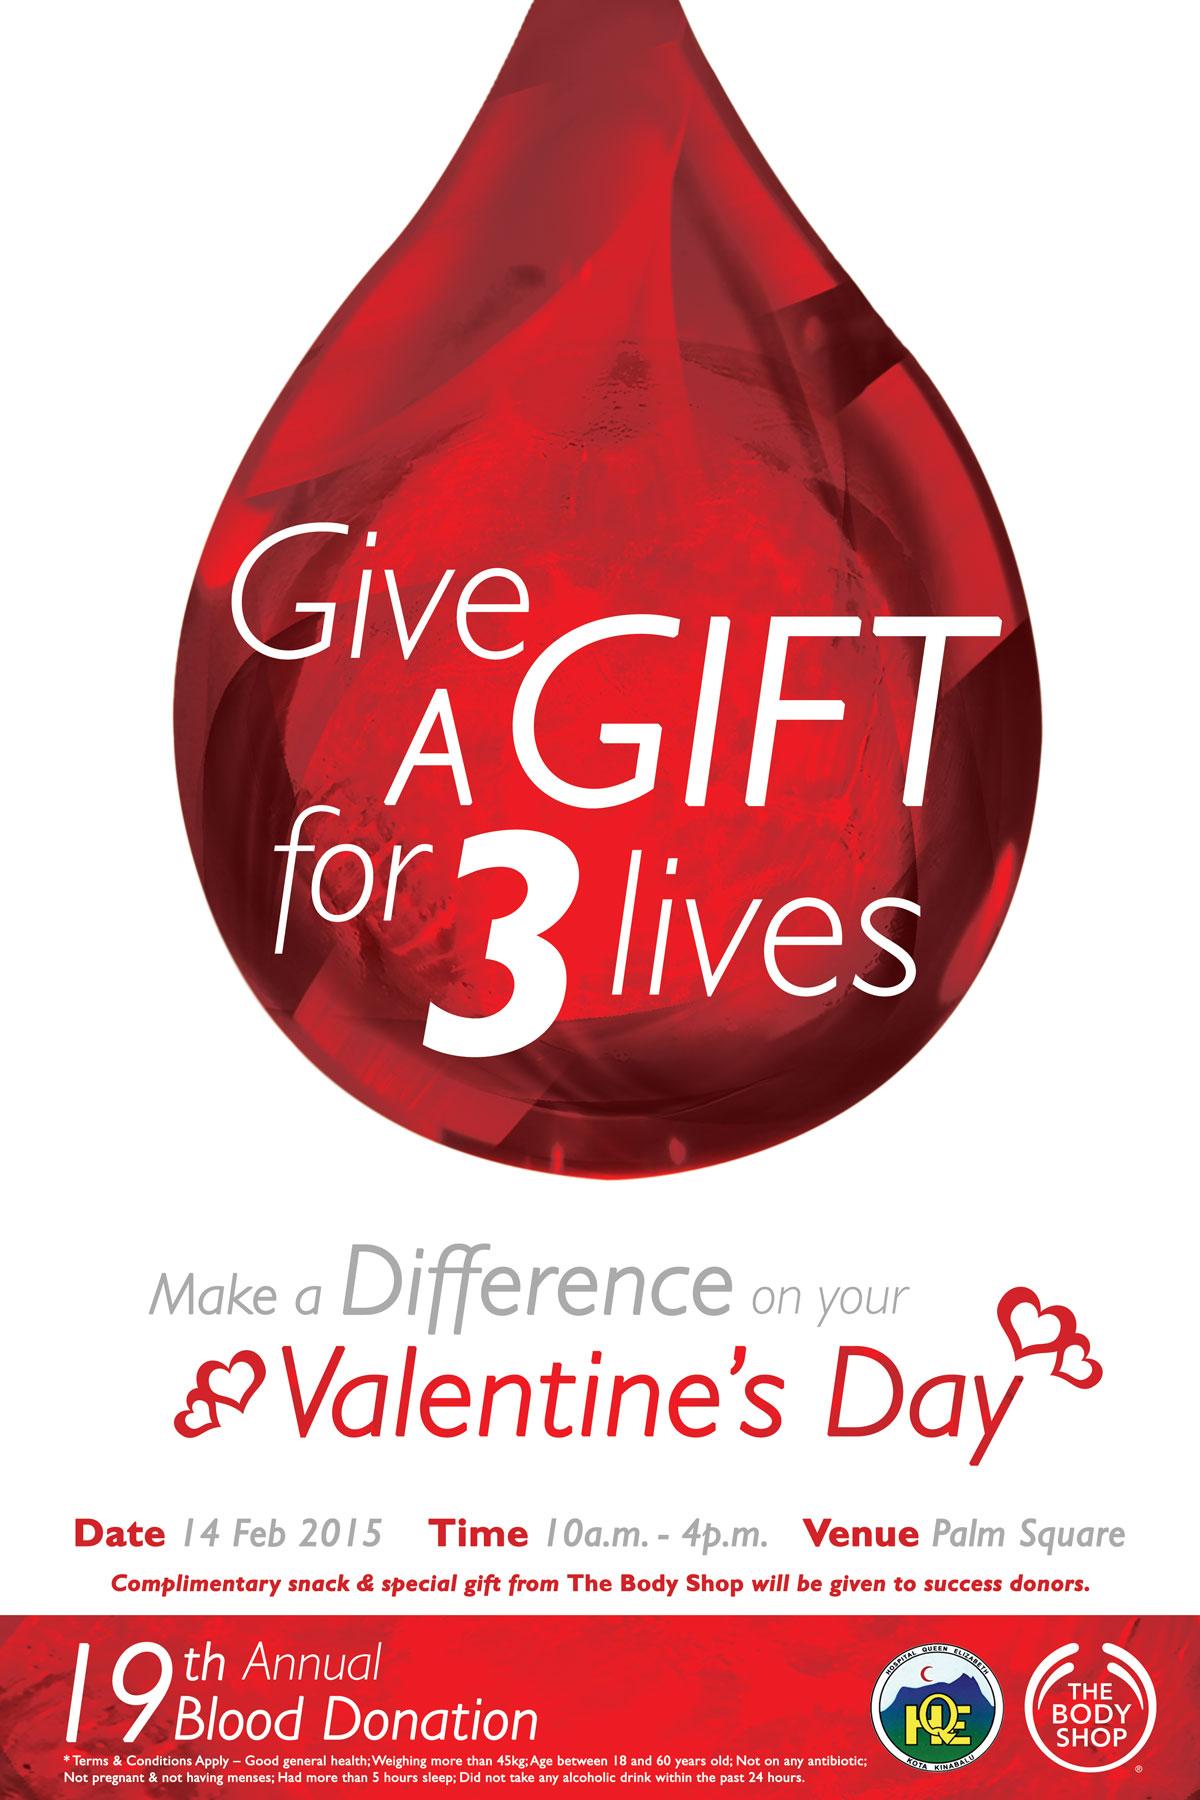 The Body Shop 19th Annual Blood Donation Invitation Poster Design 04